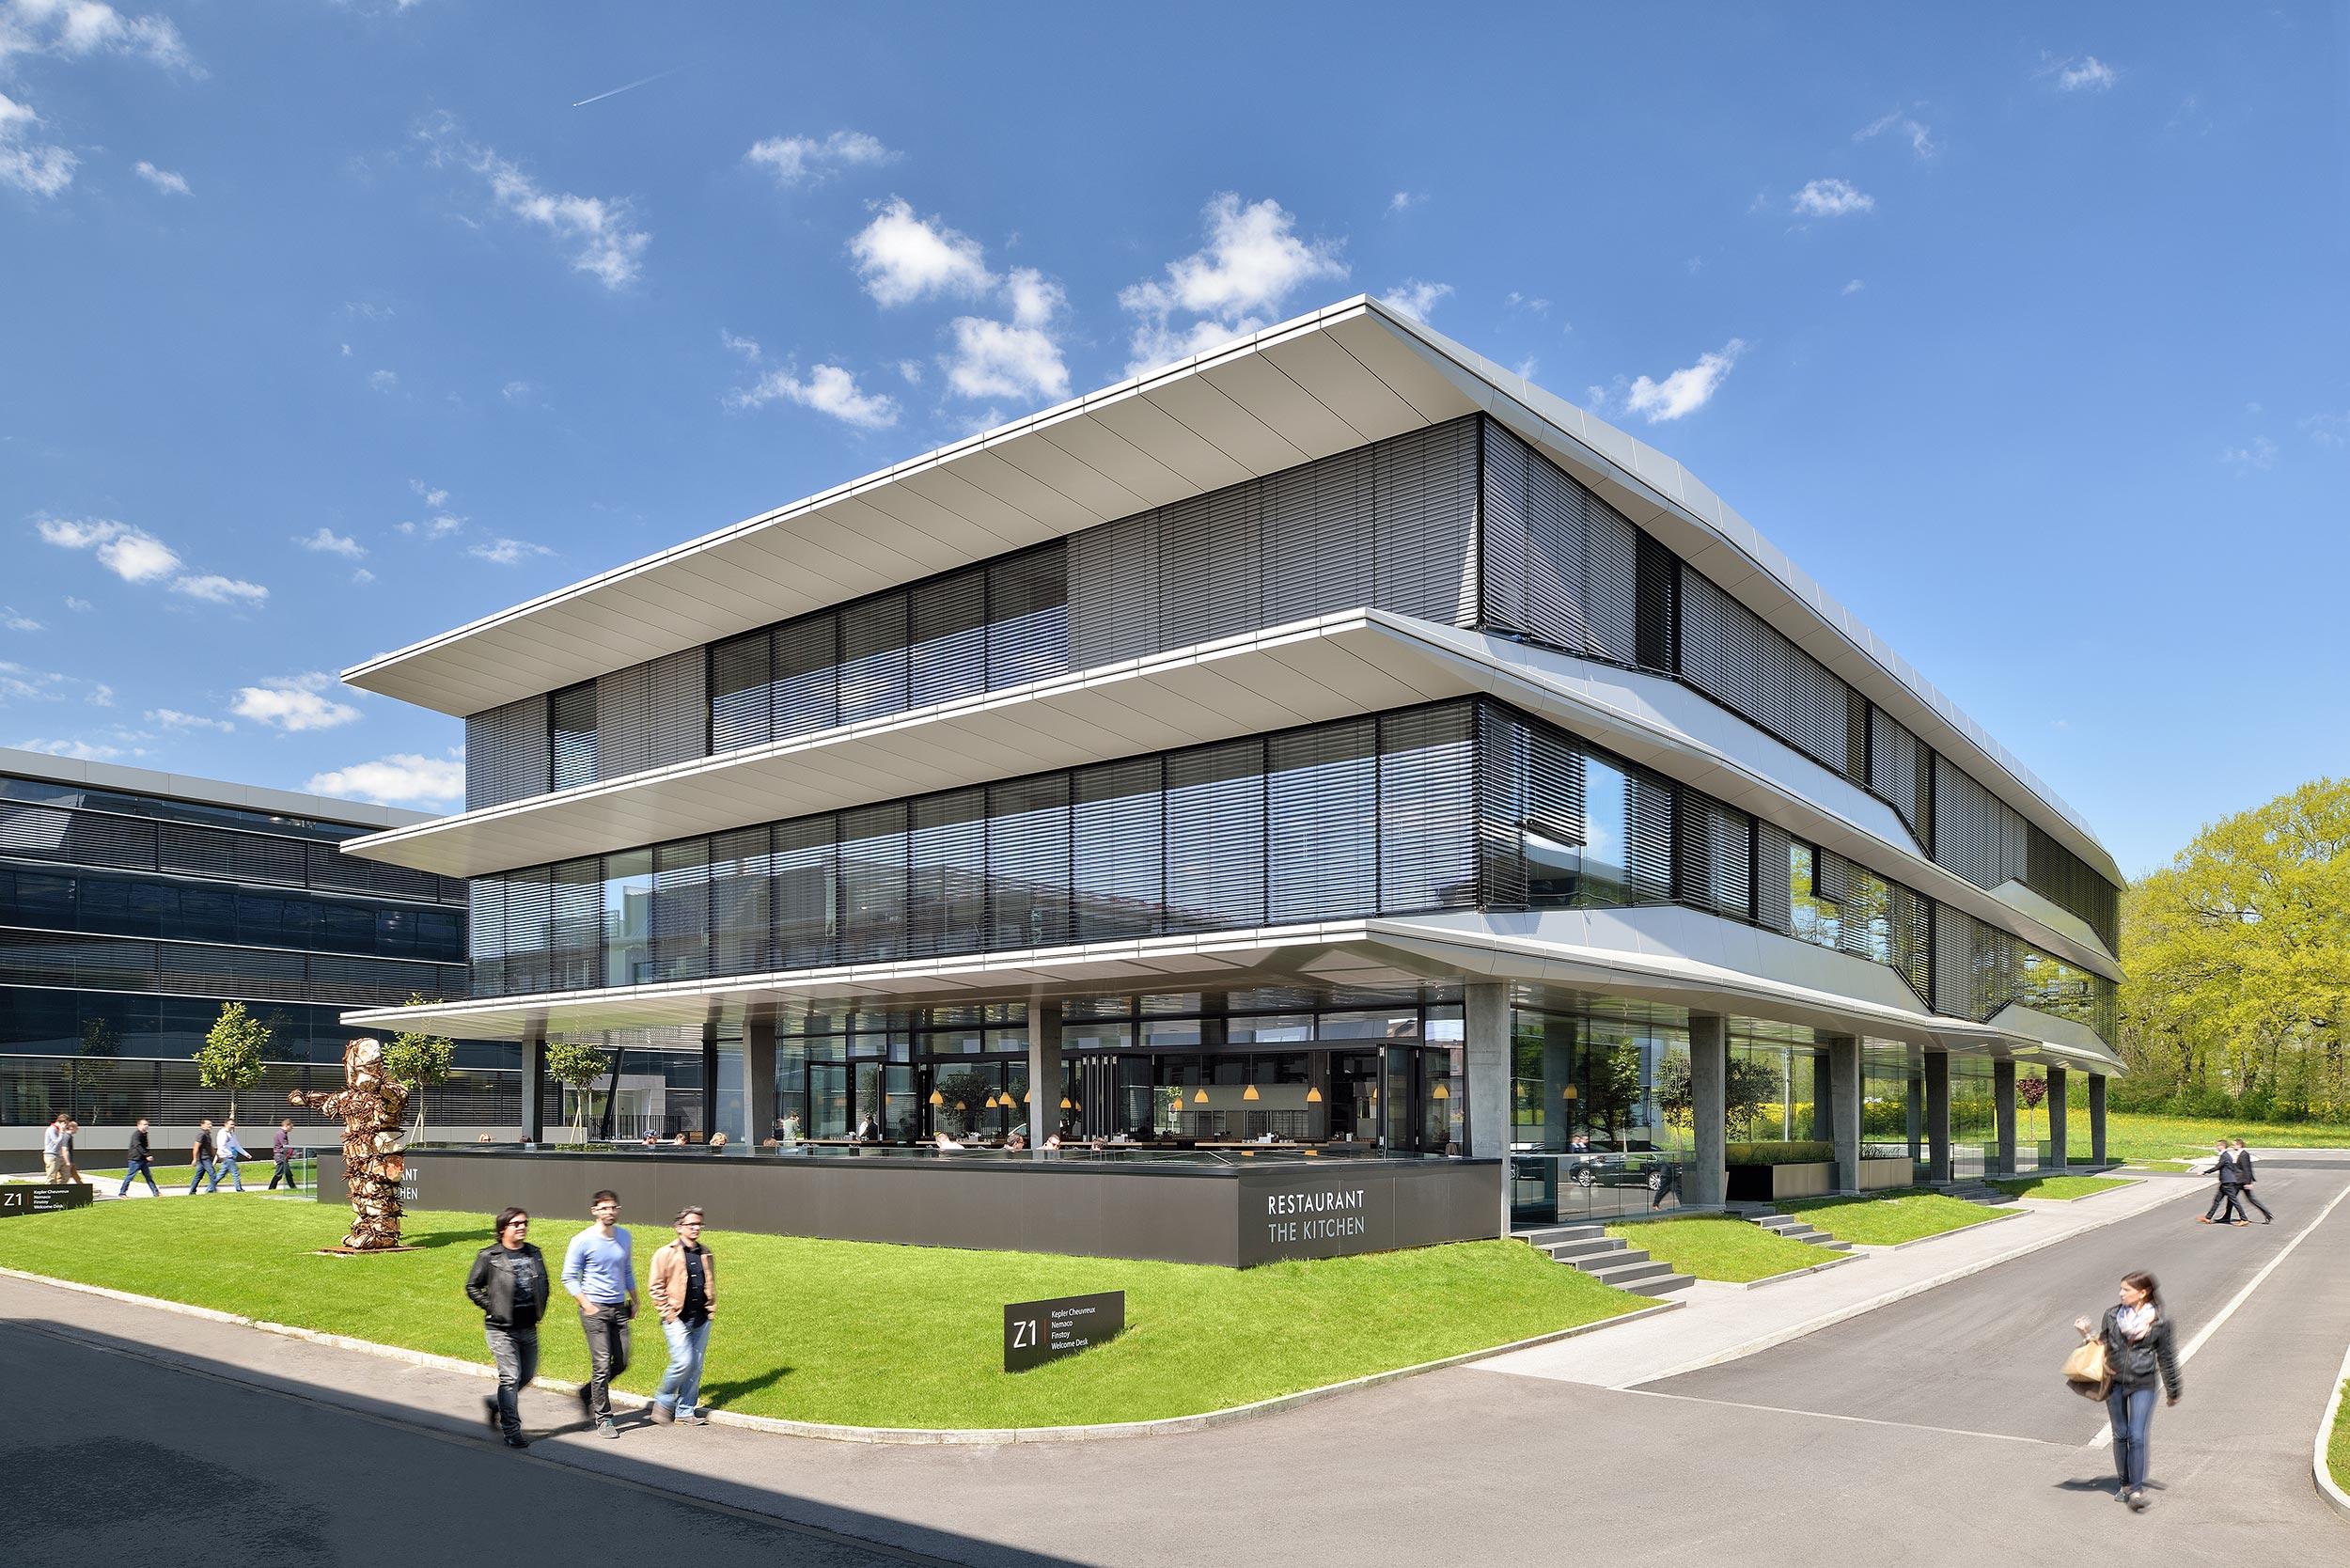 Terre Bonne Park, Zwitserland - fotograaf kantoor en architectuur Chiel de Nooyer